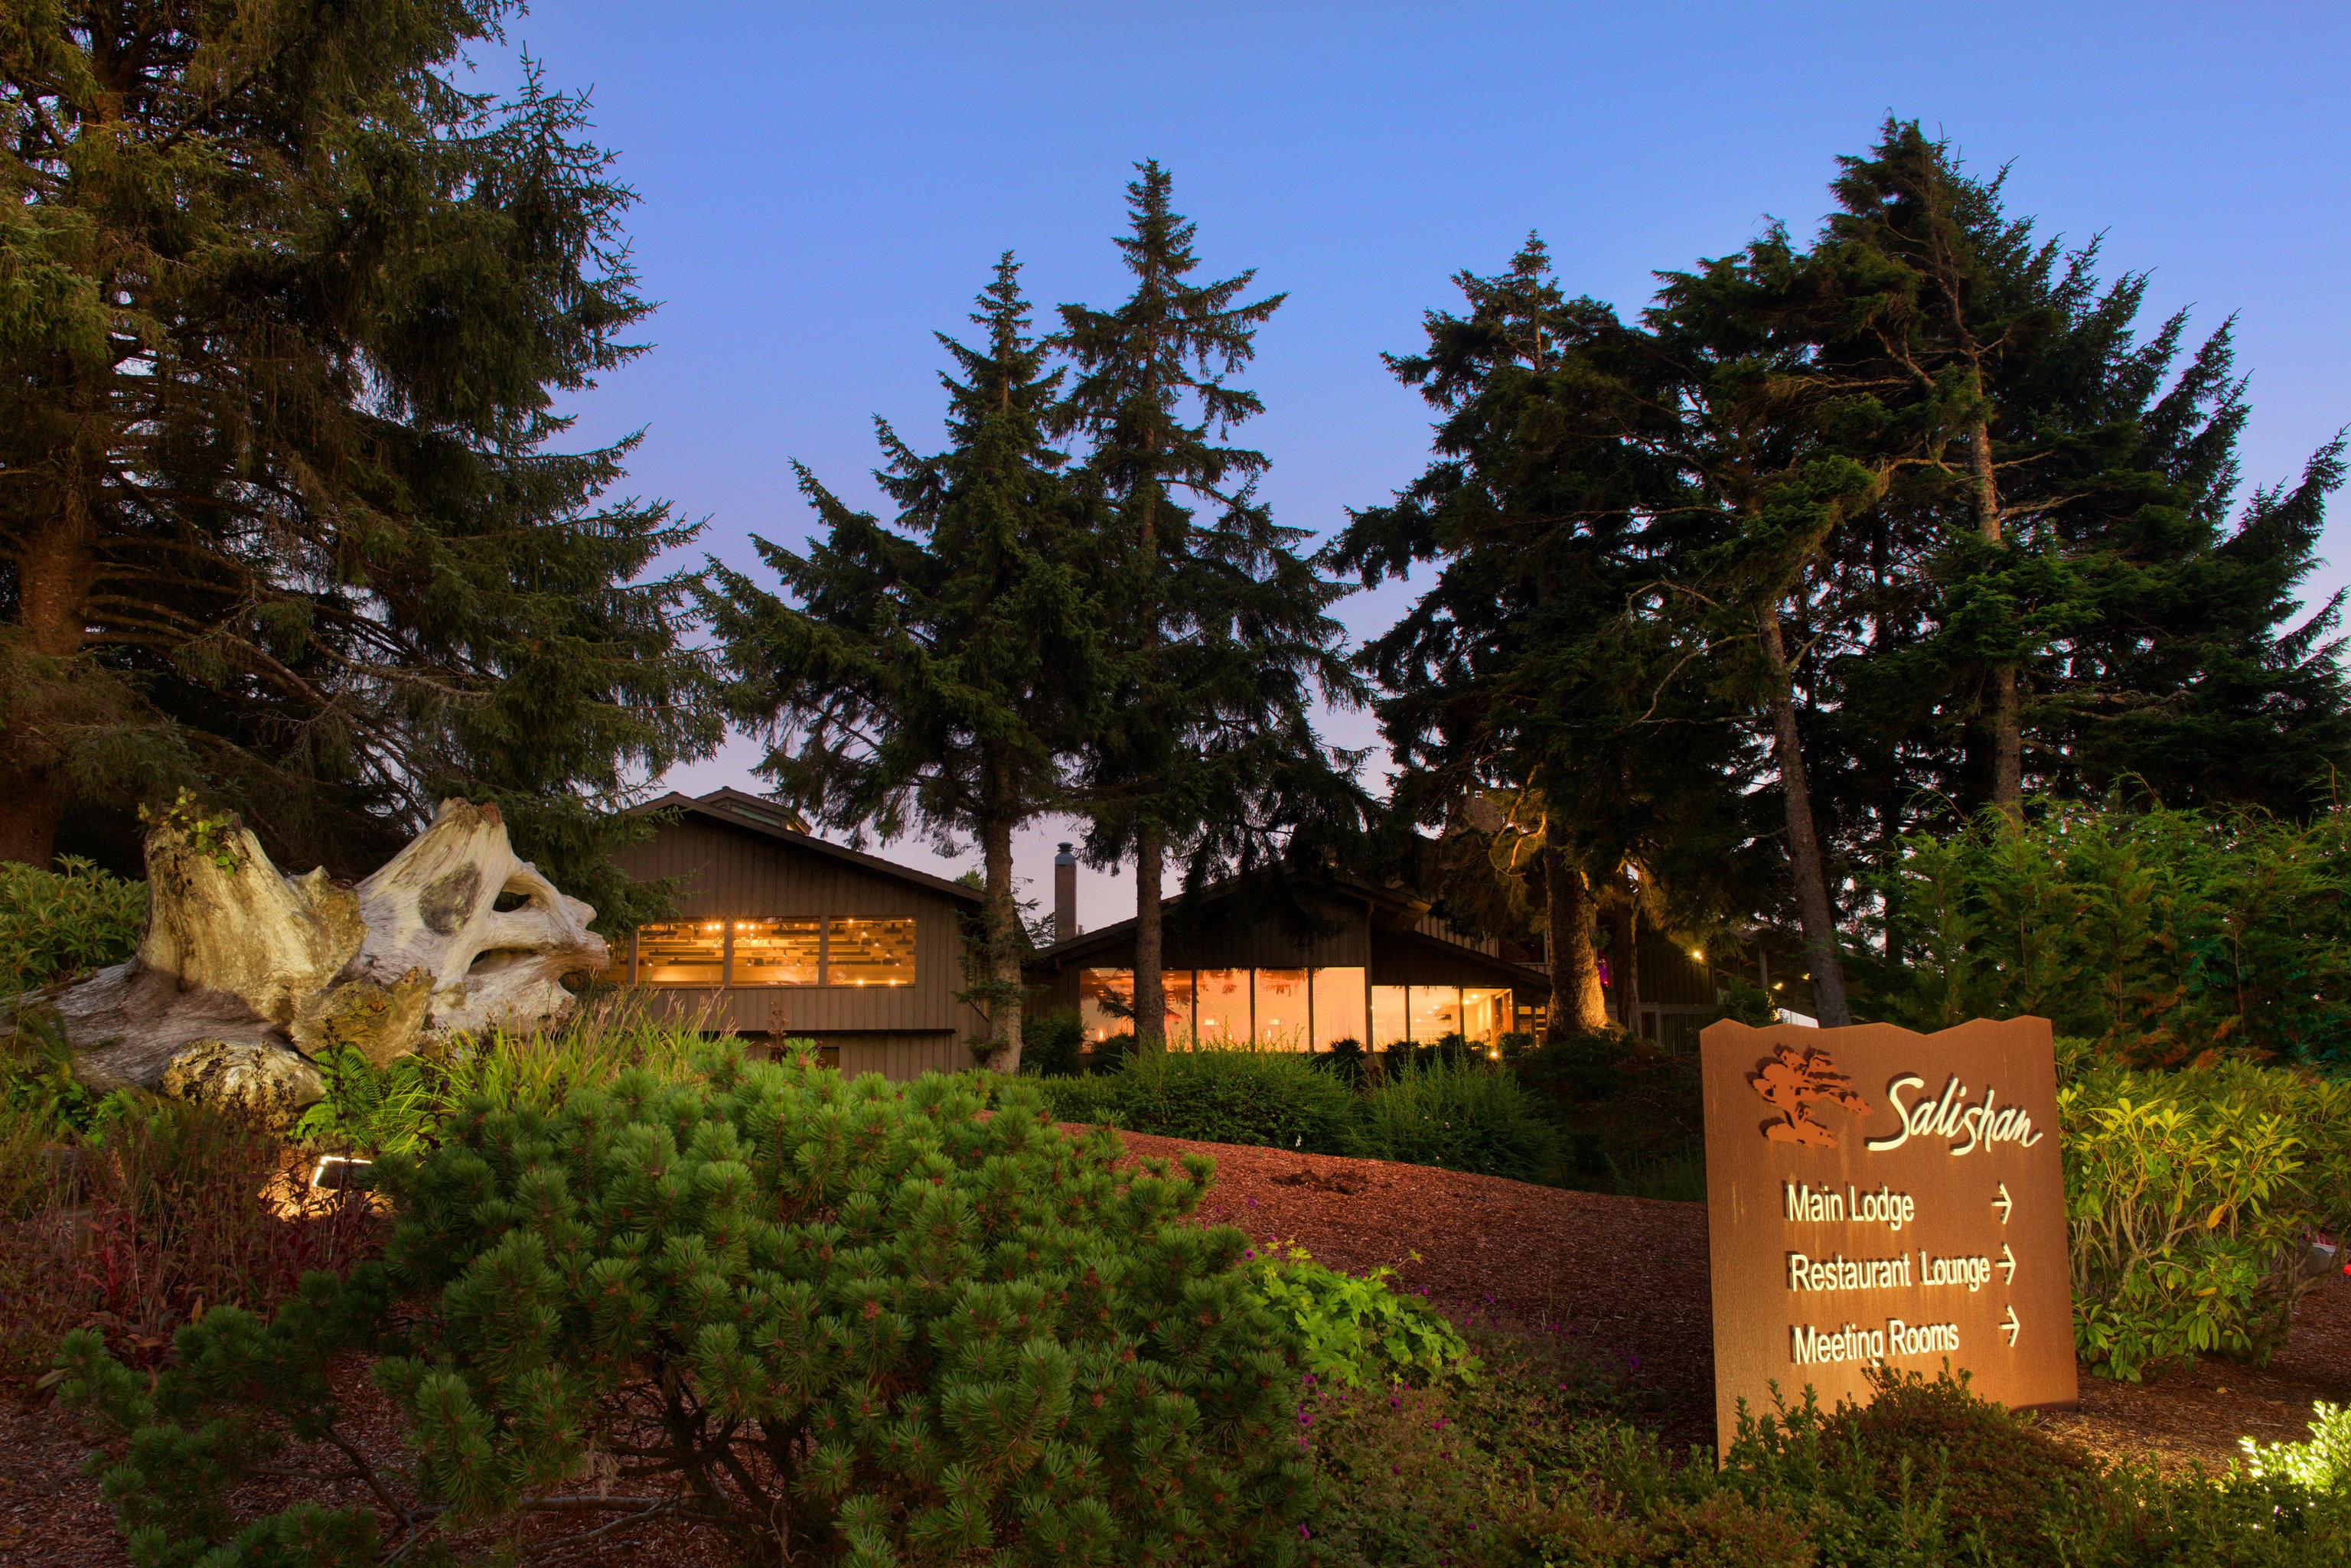 tree sky wilderness ecosystem sign conifer rural area Village plant hut Forest